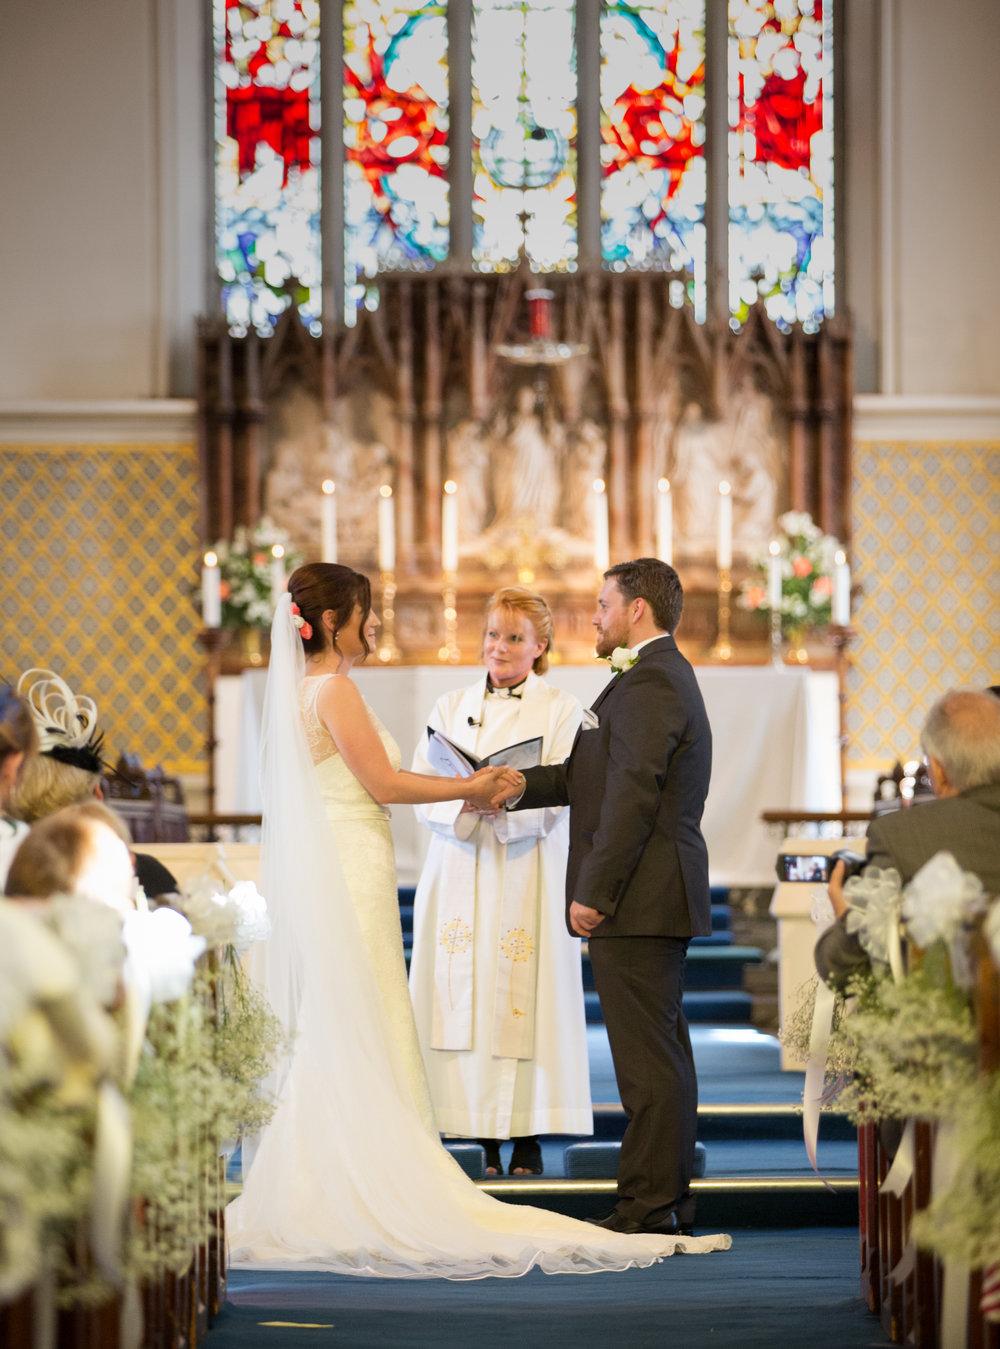 reigate-surrey-london-wedding-photography-service-church-window-46